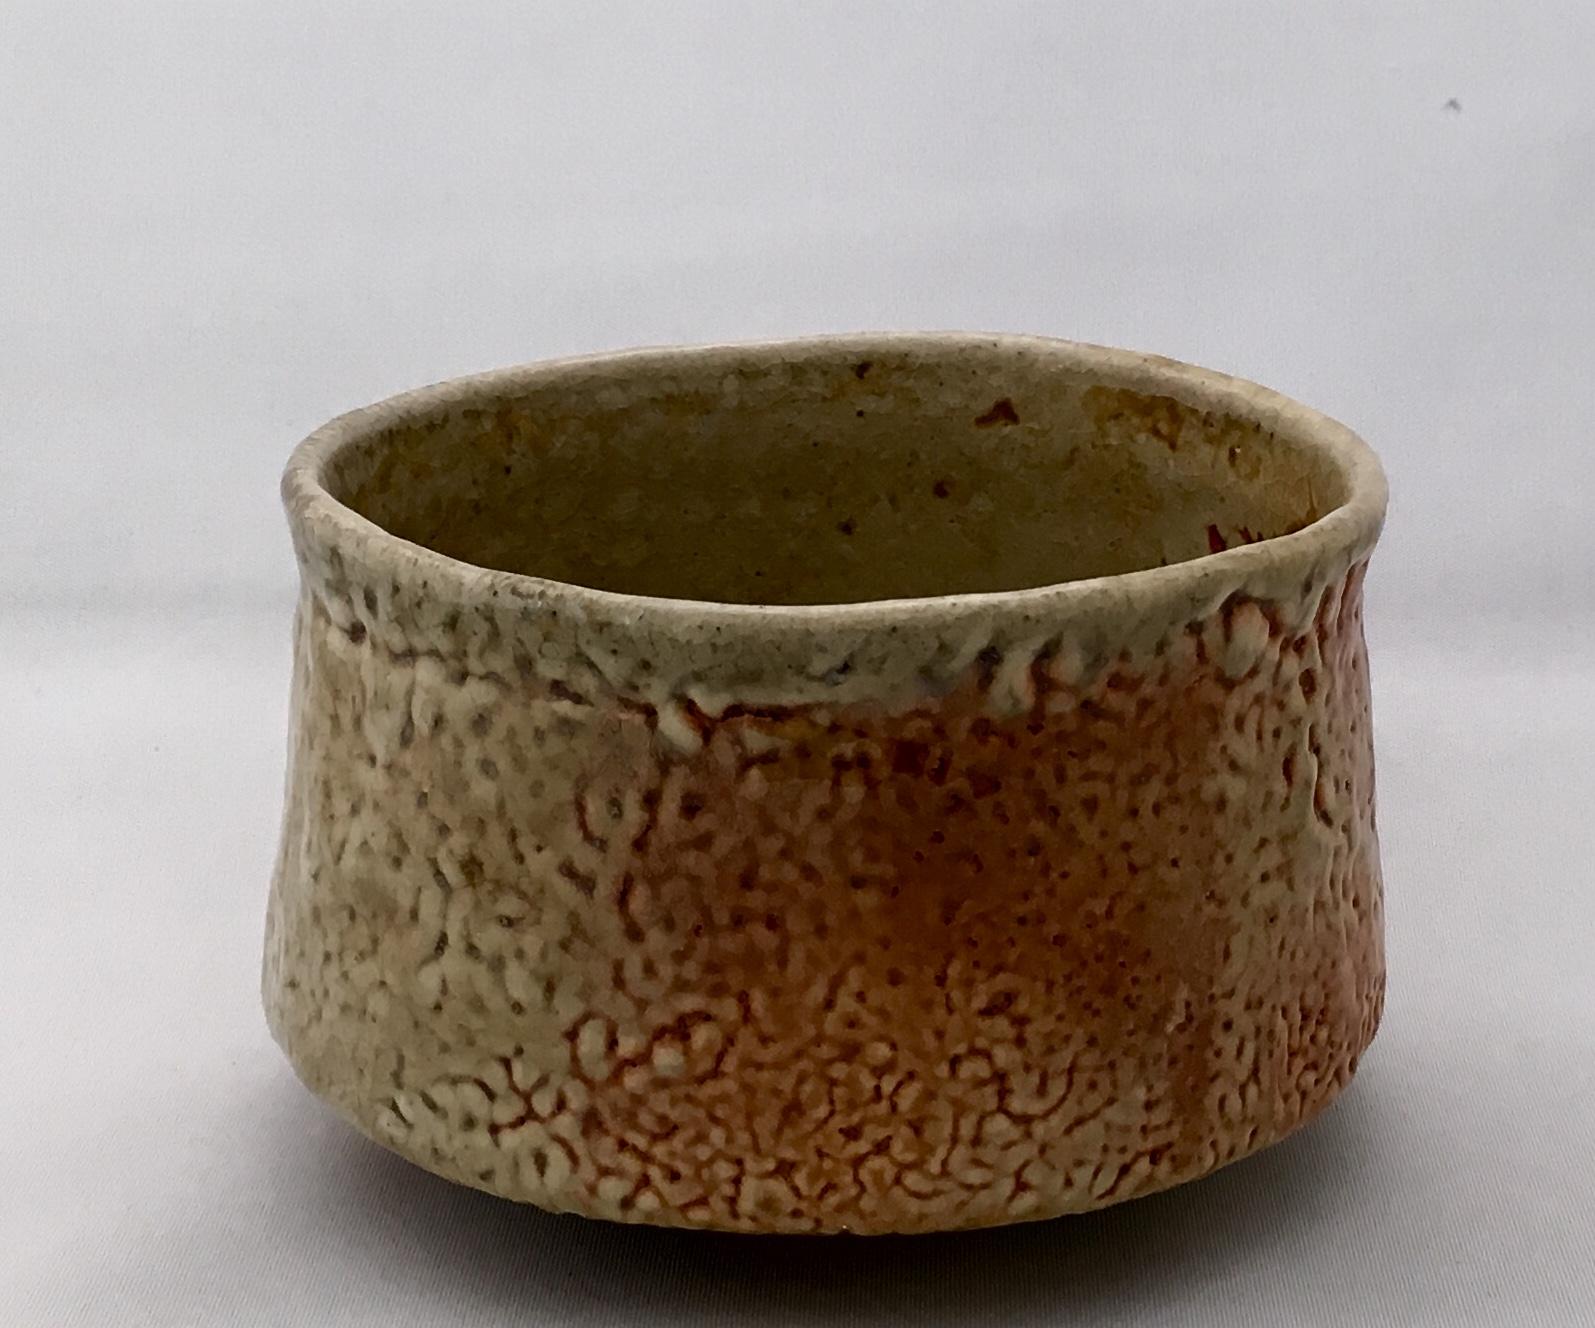 tea bowlIMG_5131.jpg